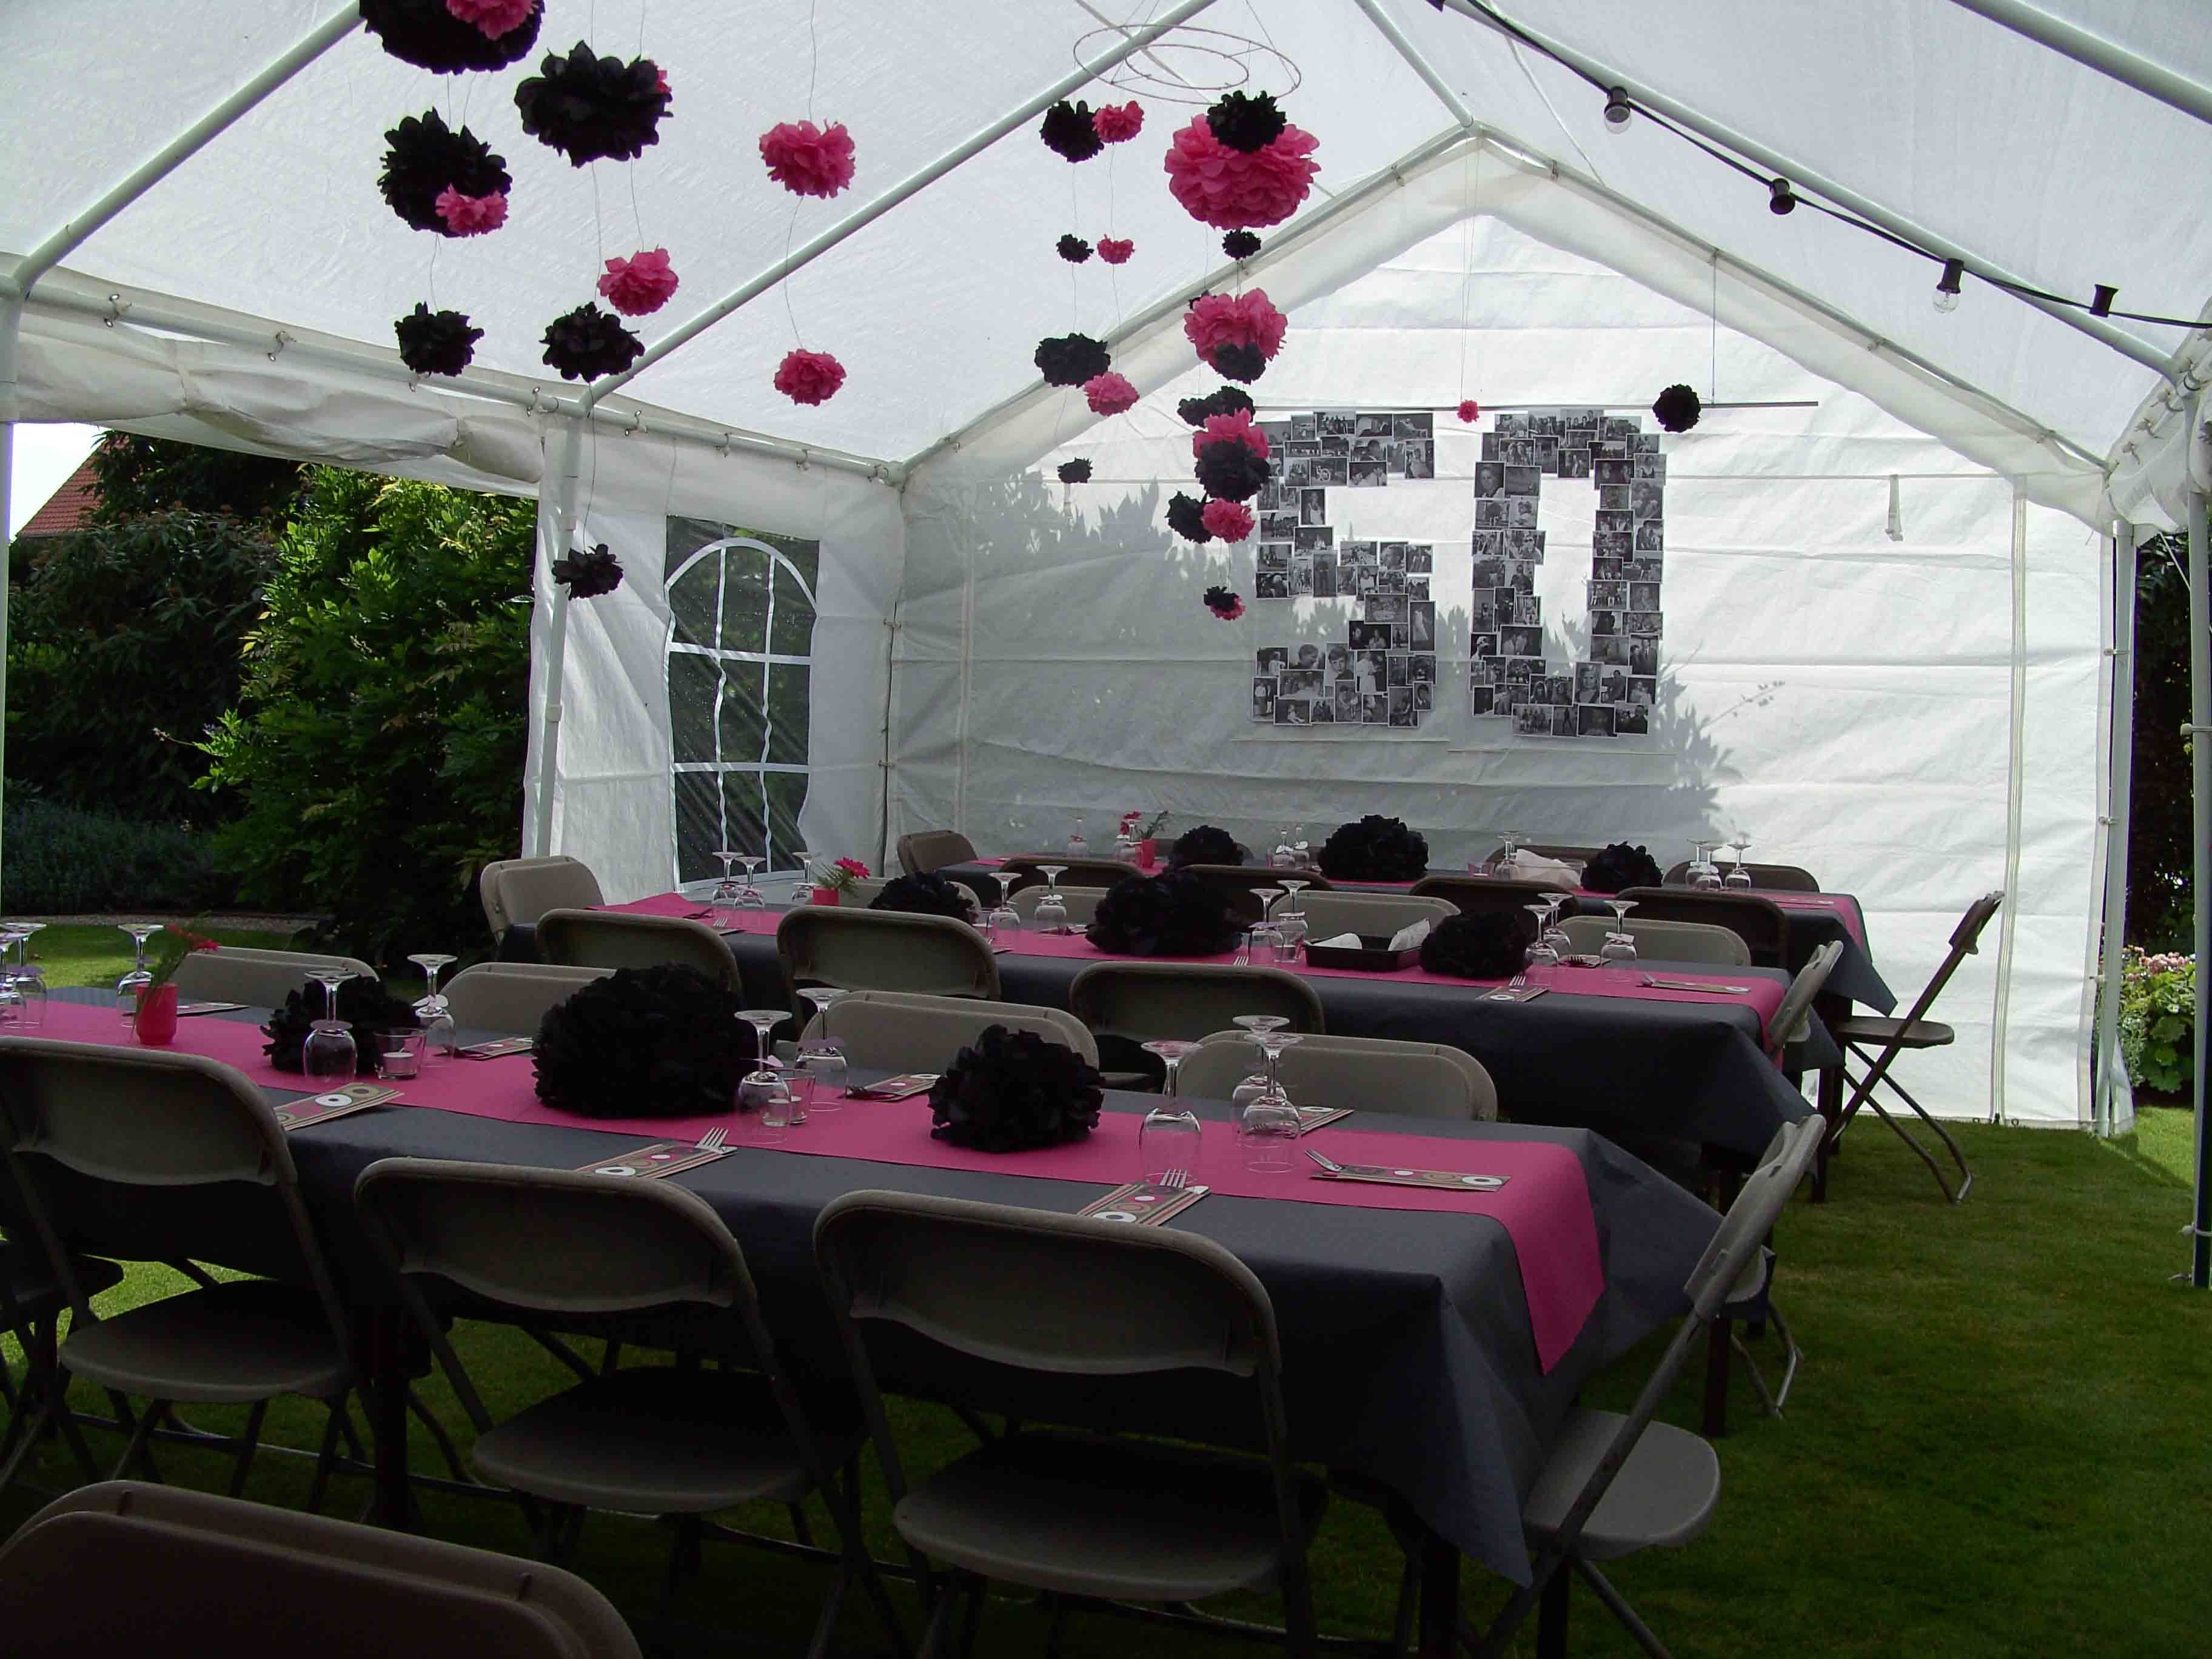 50 jarig feest organiseren tuinfeest 50 jaar | 80th birthday parties | Pinterest | 50th, 50th  50 jarig feest organiseren